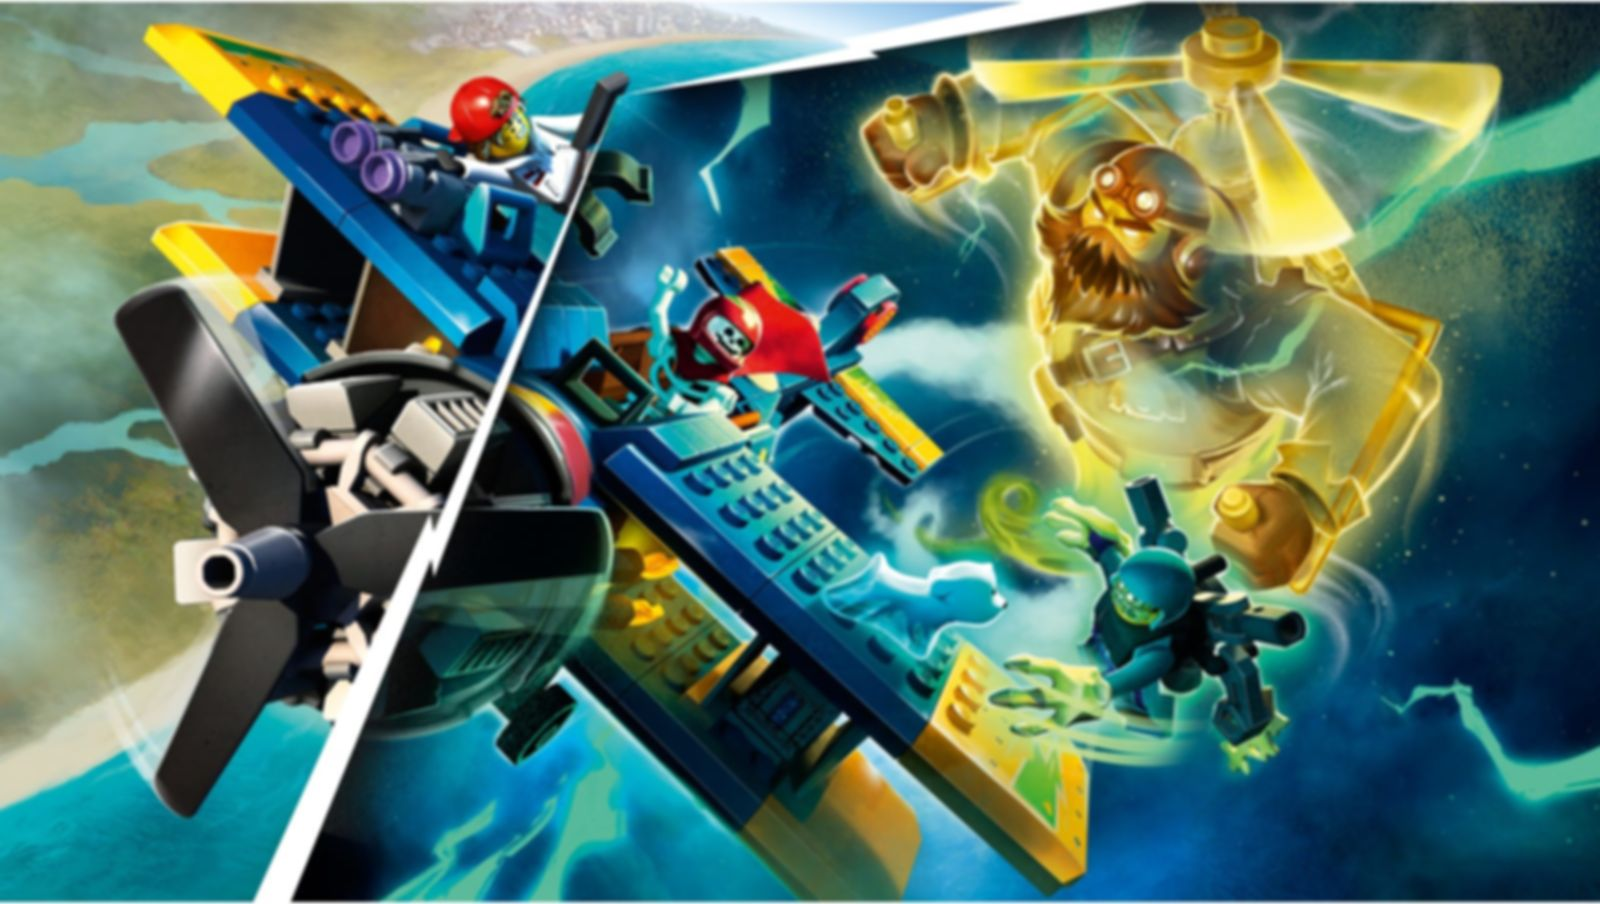 El Fuego's Stunt Plane gameplay